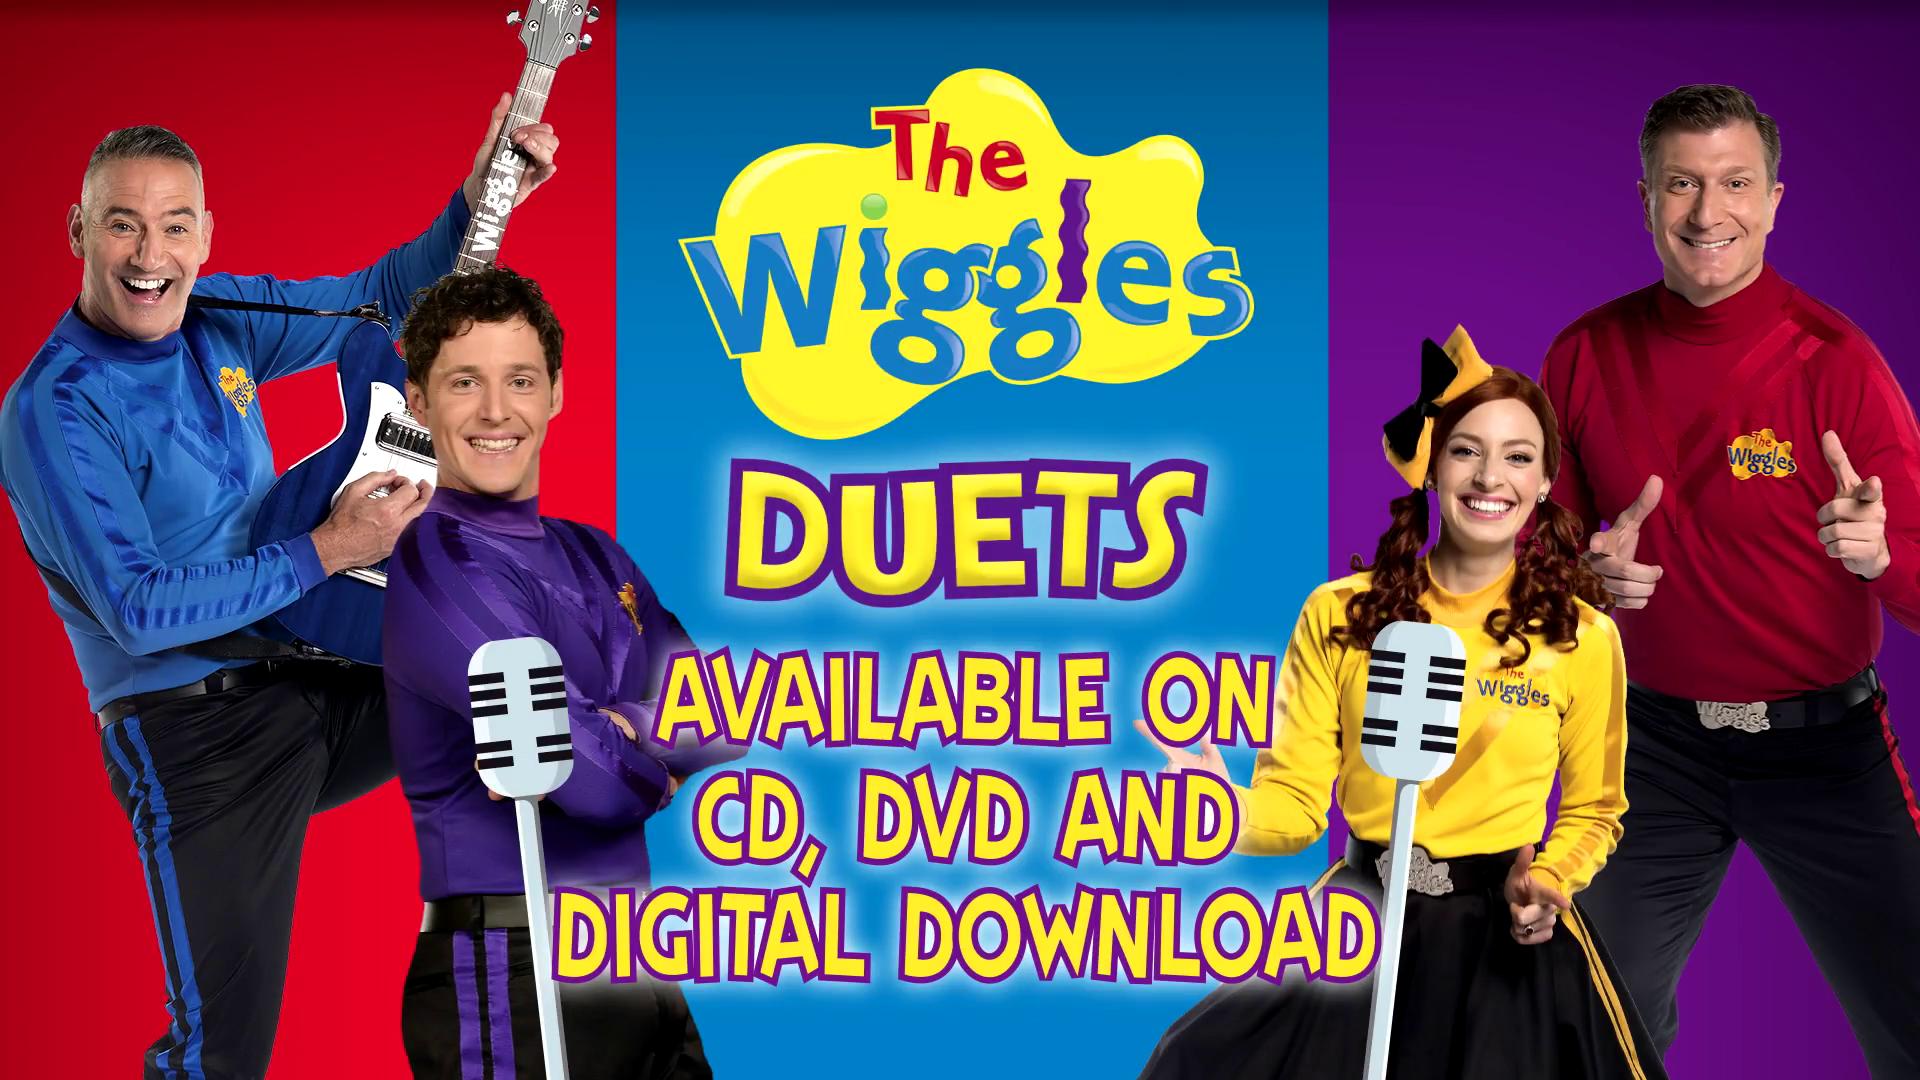 Duets/Marketing